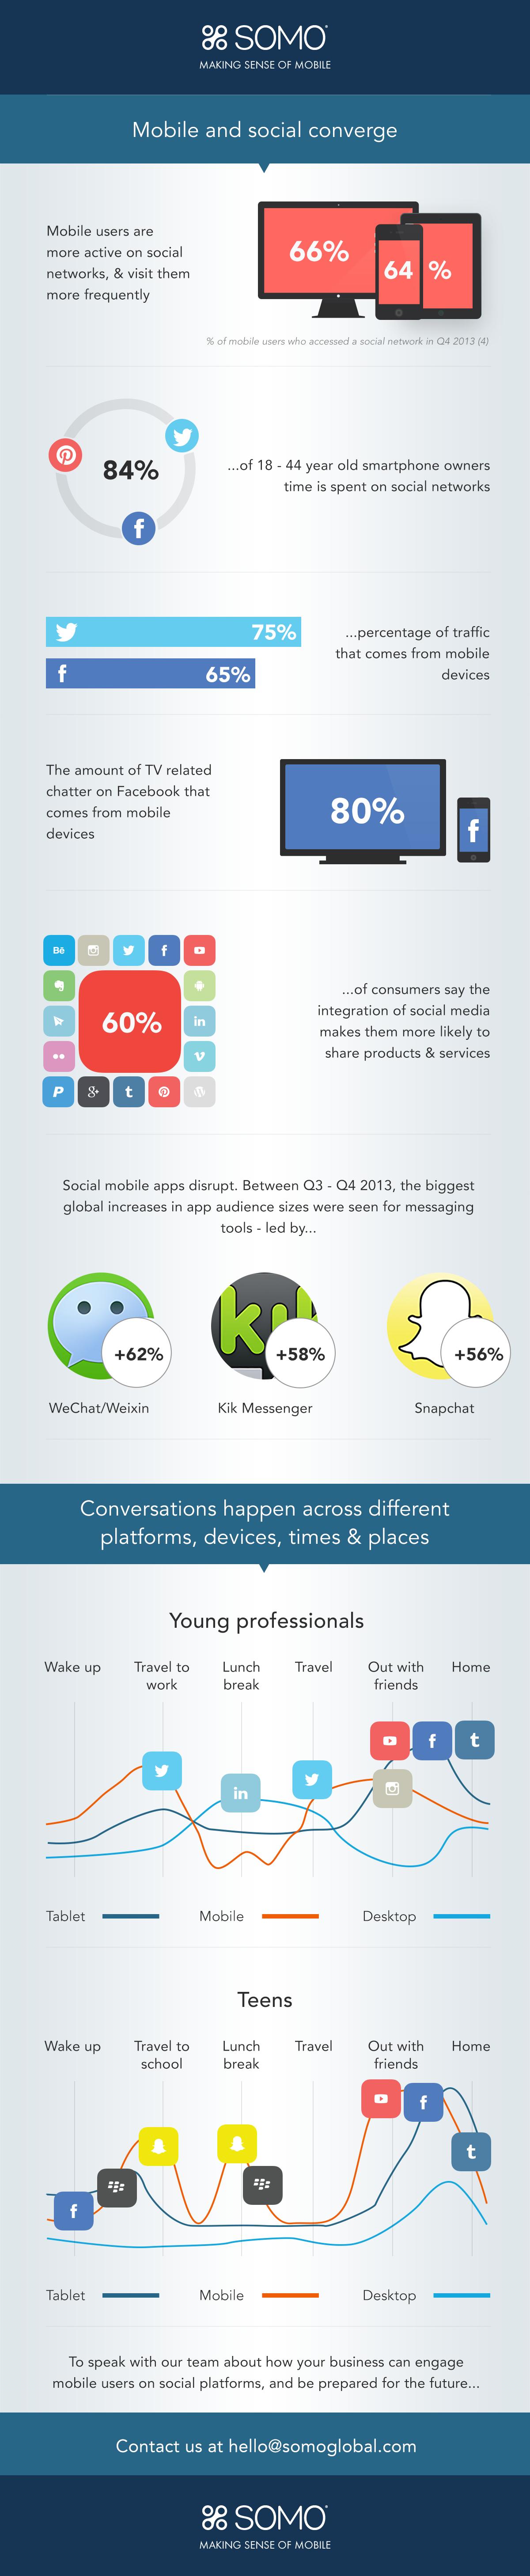 Mobile-Social-Media-Infographic